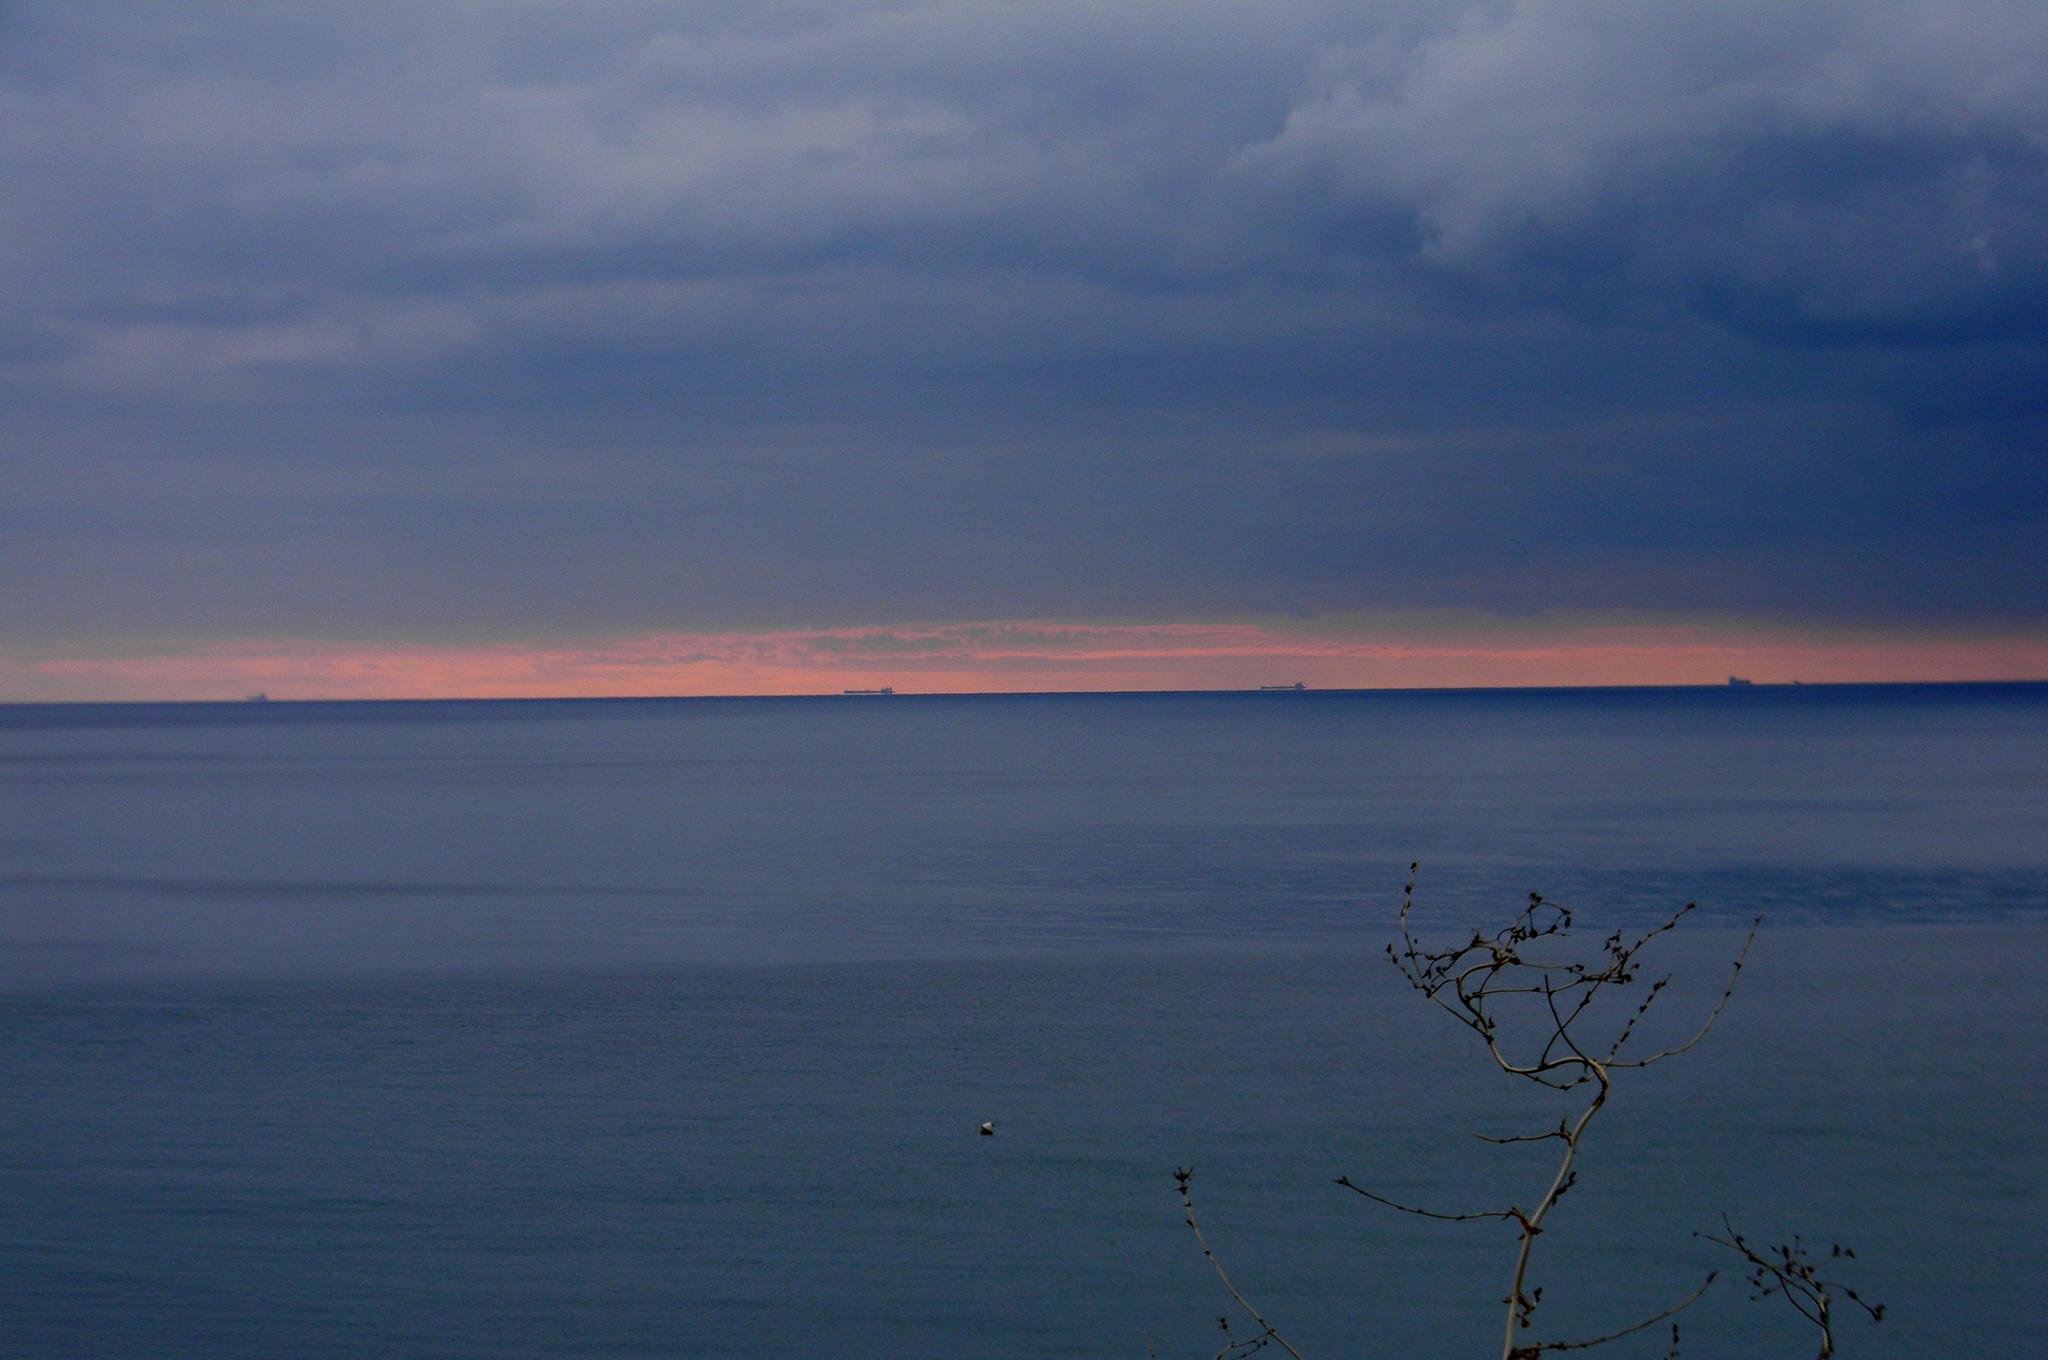 Kara-dag. Crimea. 2014 by mongolokazap